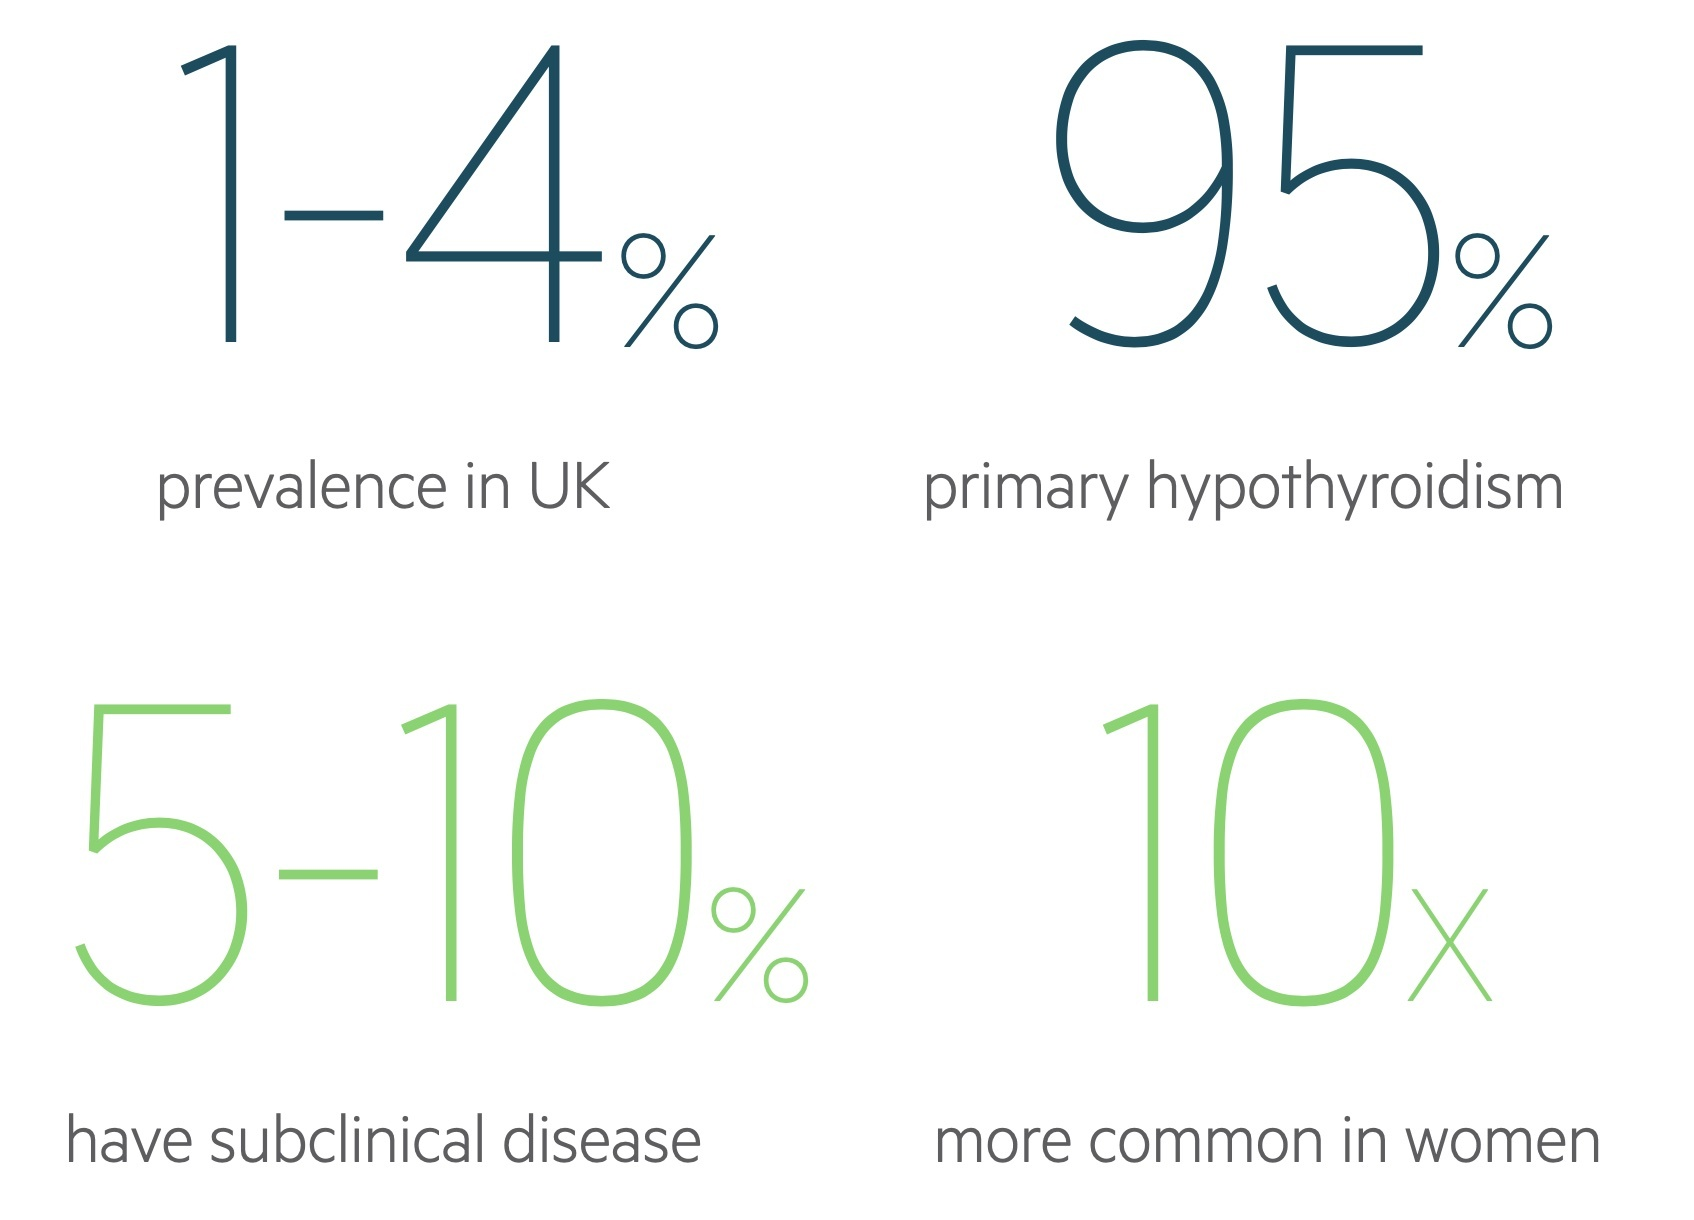 Hypothyroidism statistics